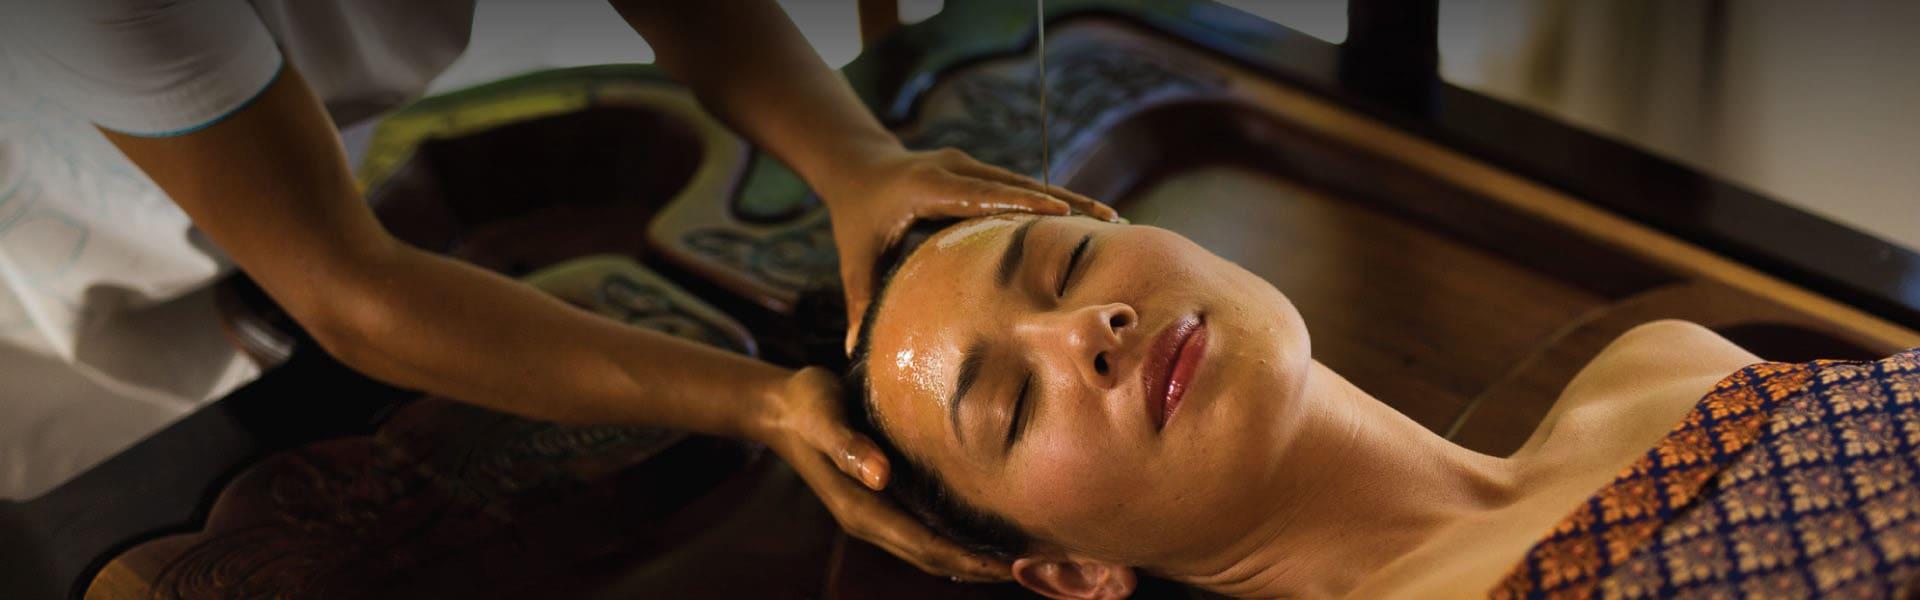 Maldives Couples Only Resorts | Anantara Veli Couple's Massage